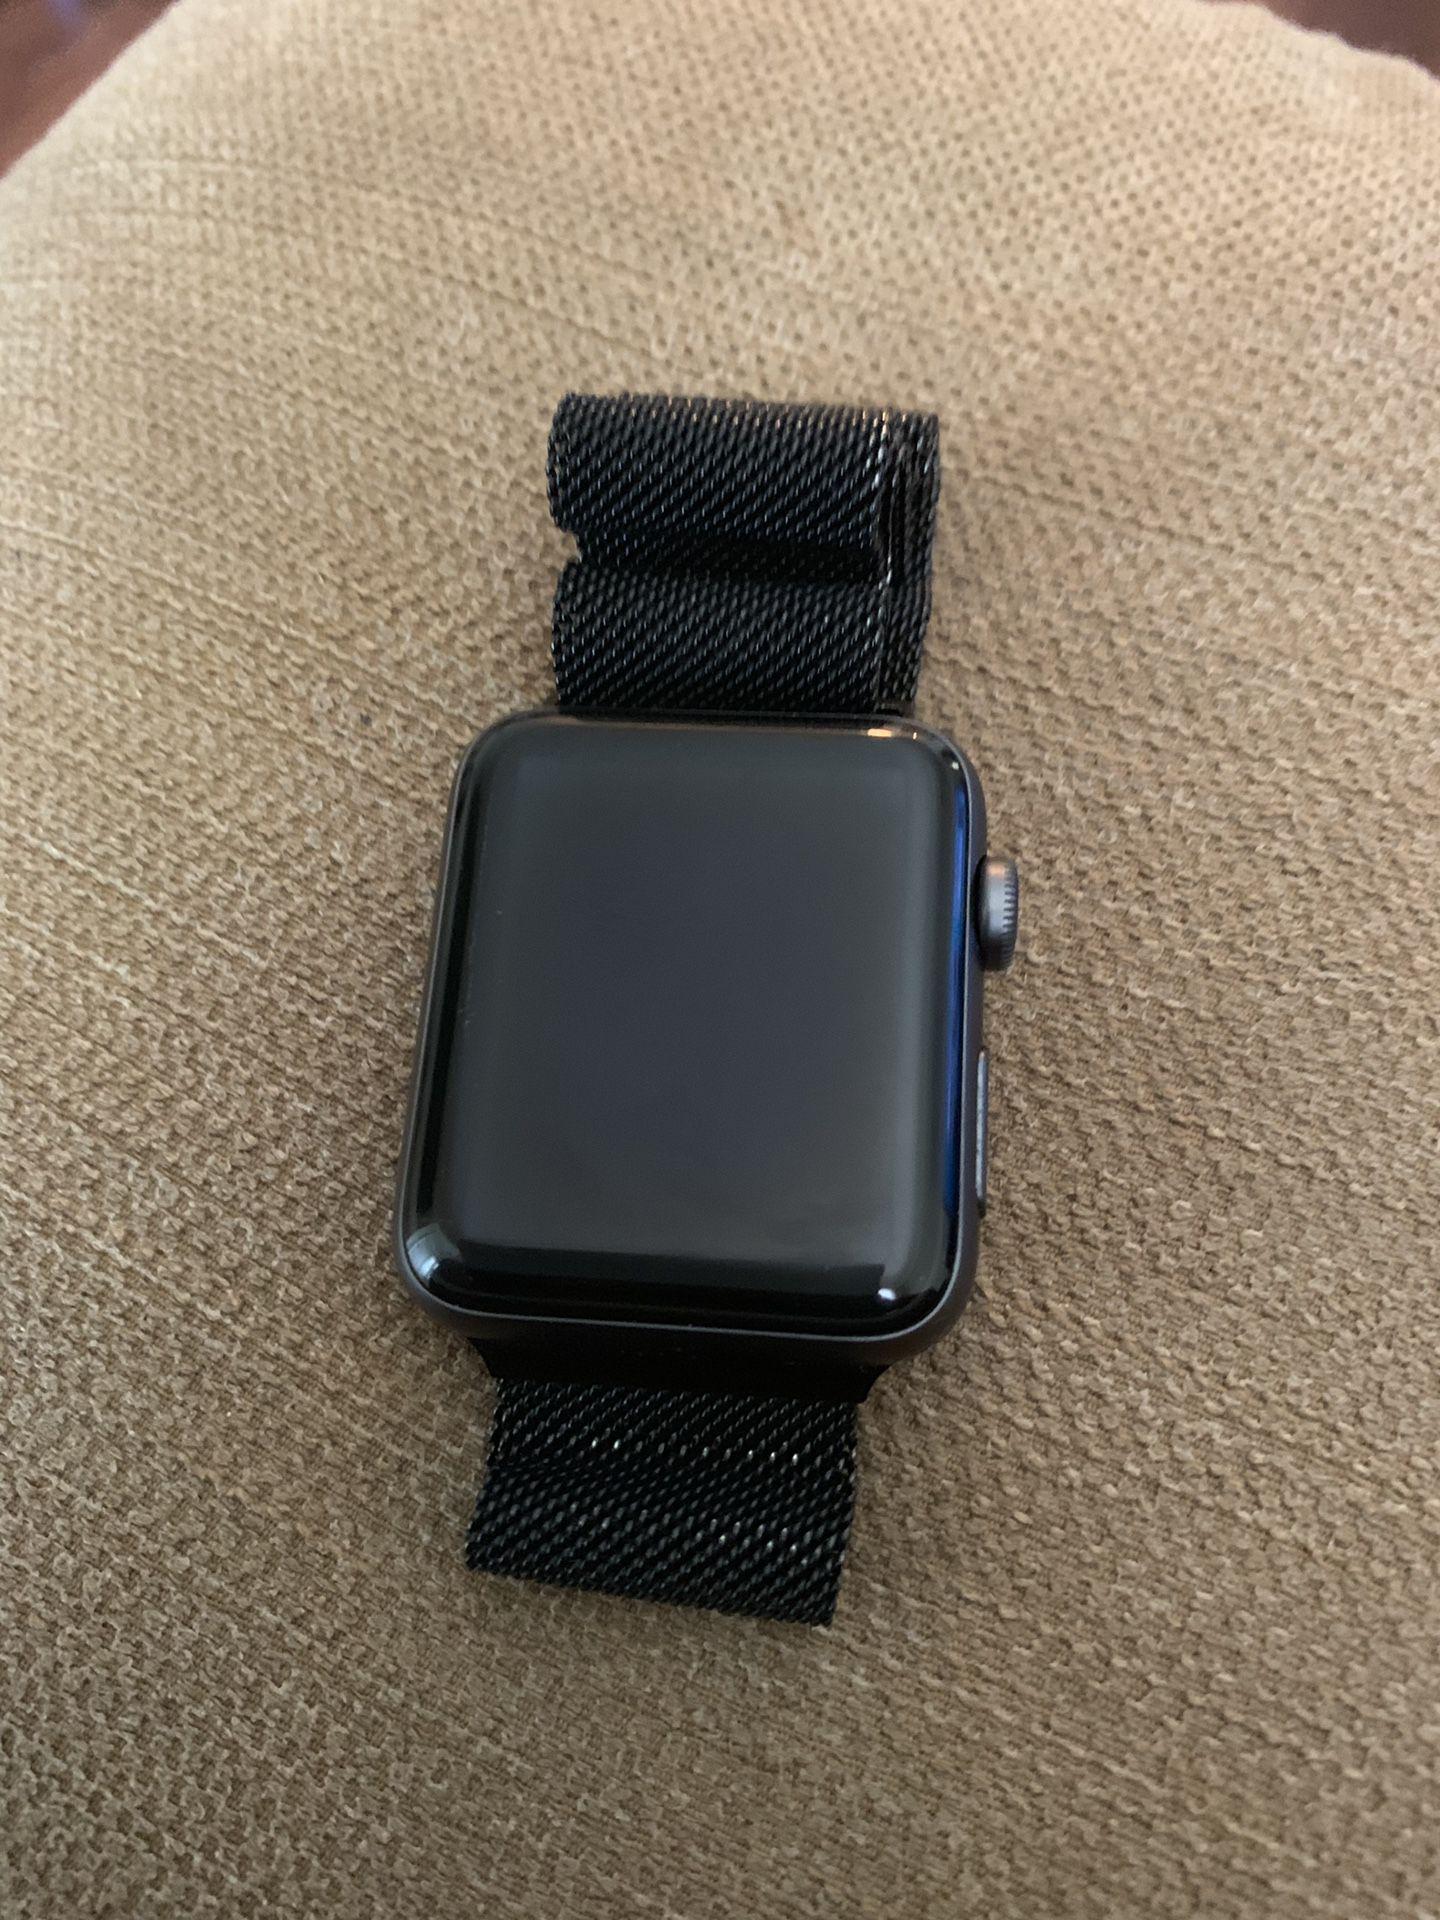 Apple Watch series 3 cellular unlocked42 mm